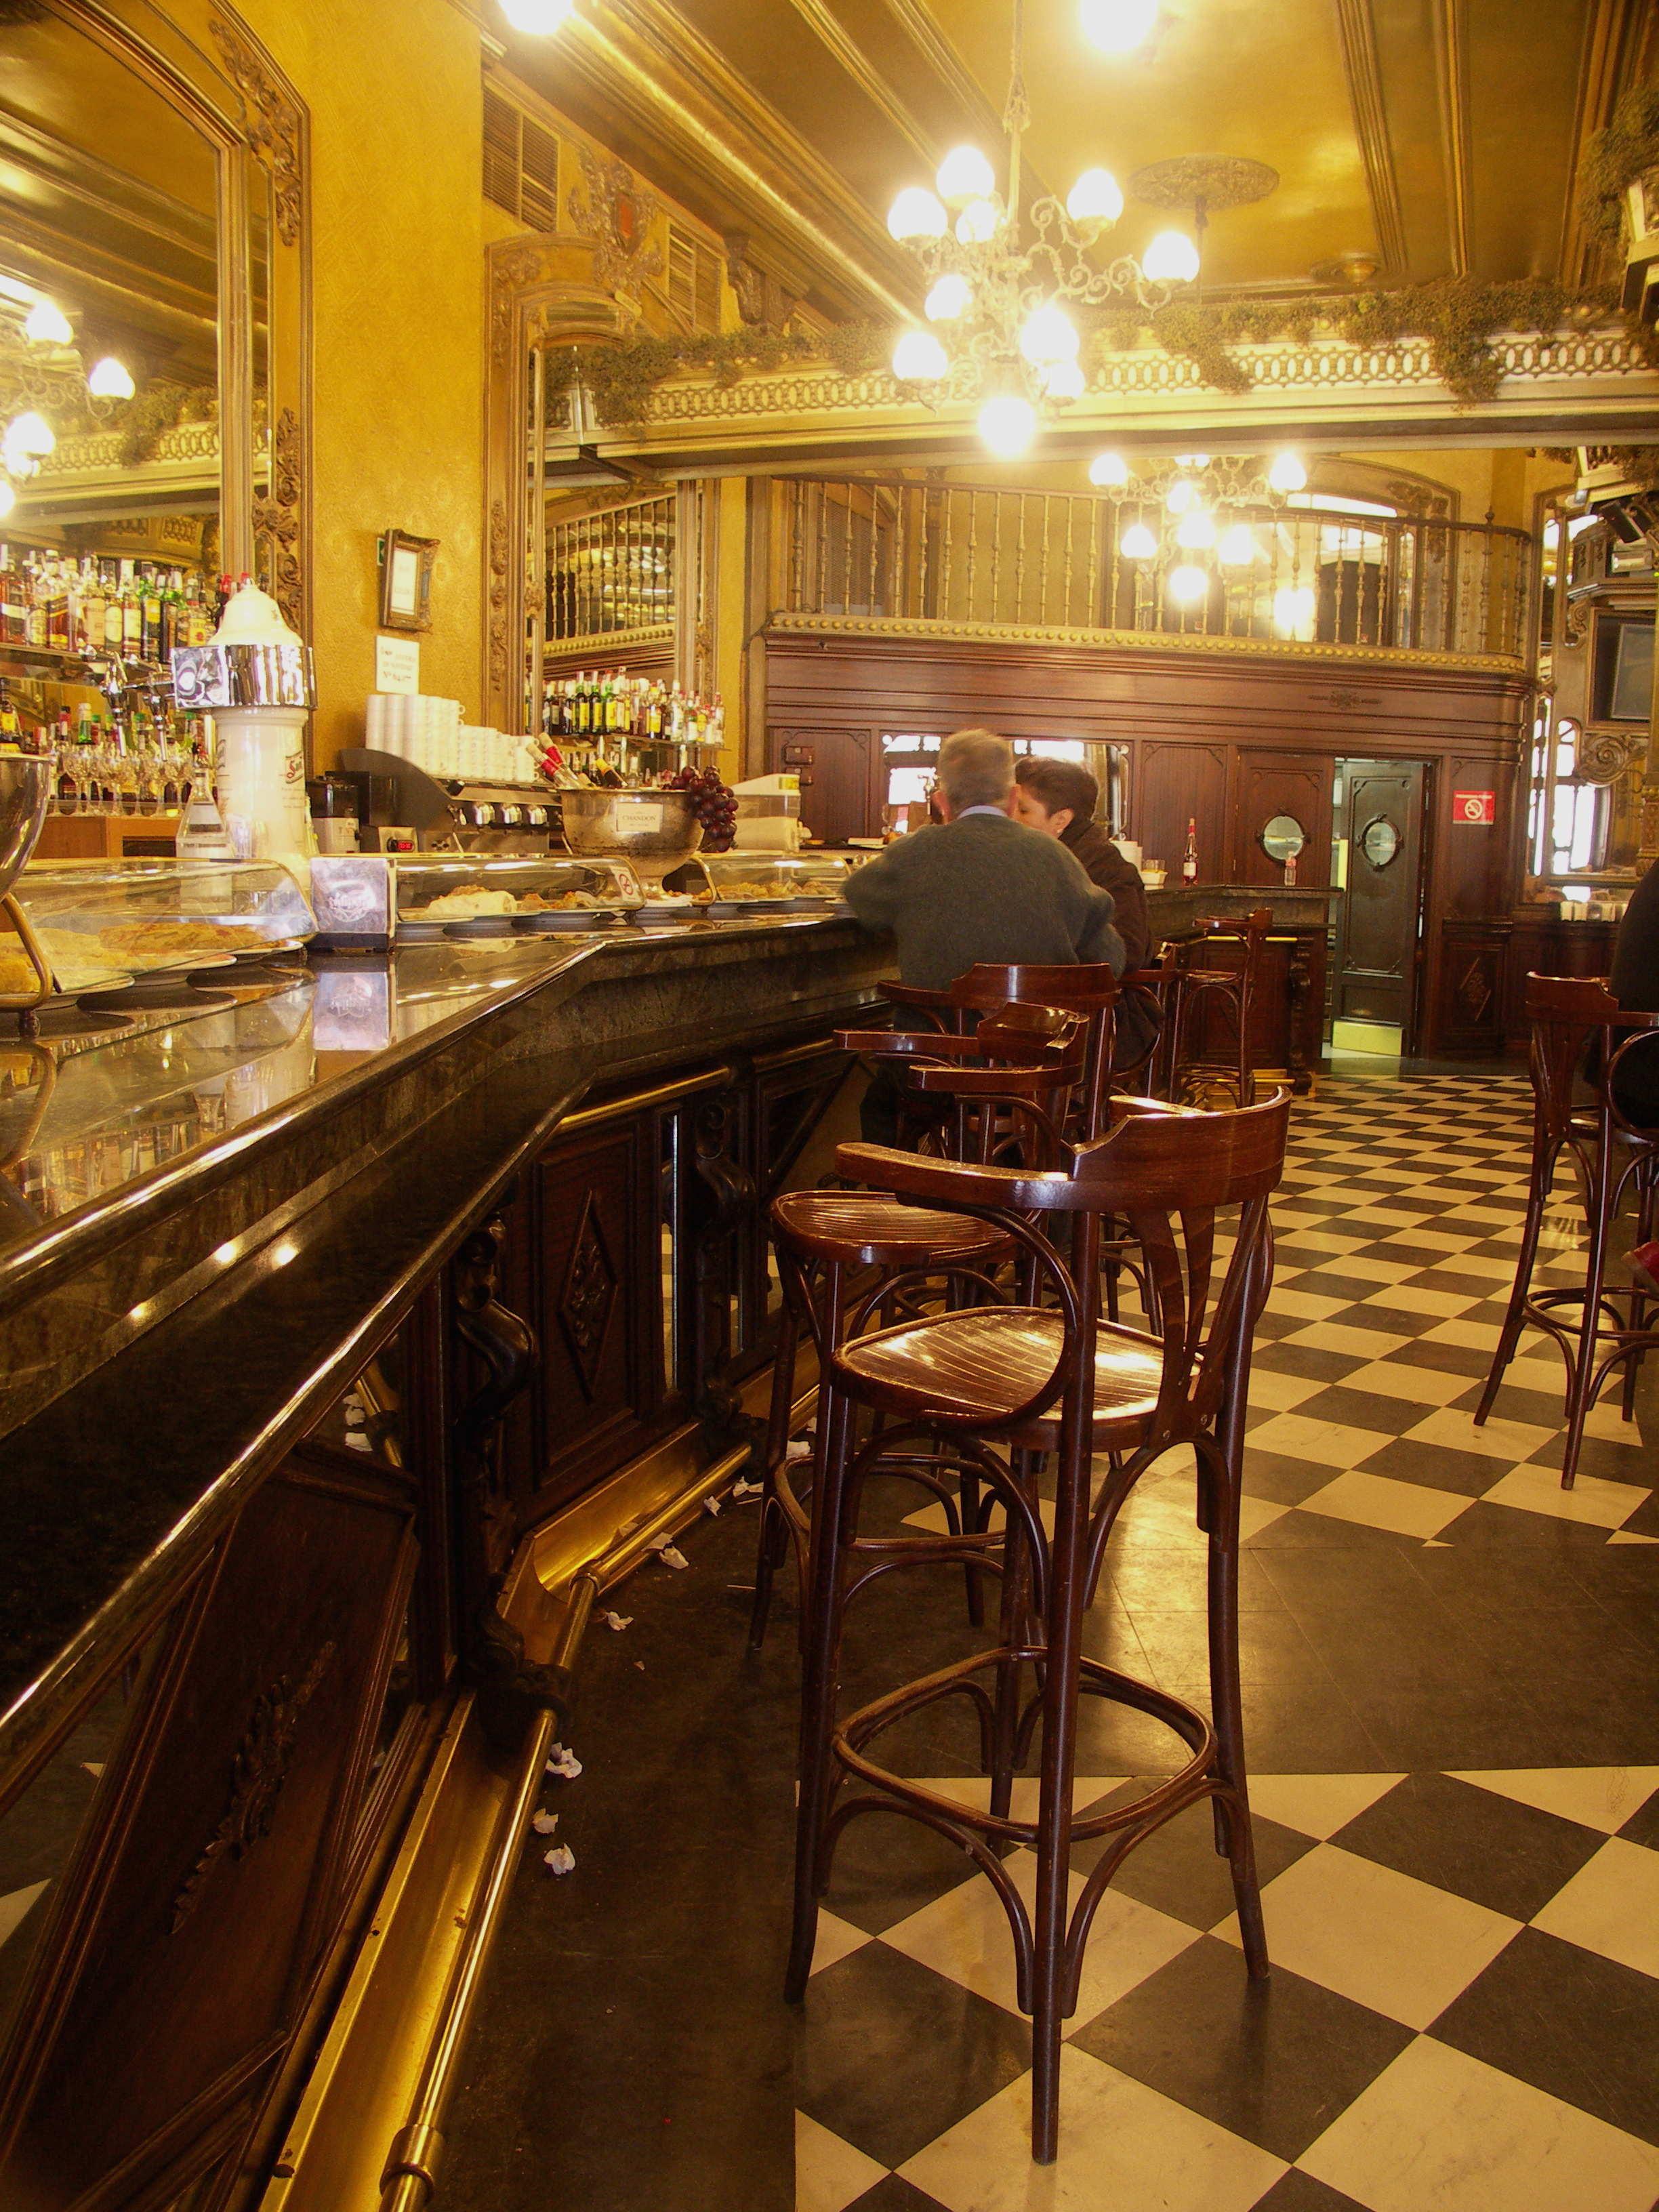 Deco Lounge Bar Restaurant - Rellik.us - rellik.us